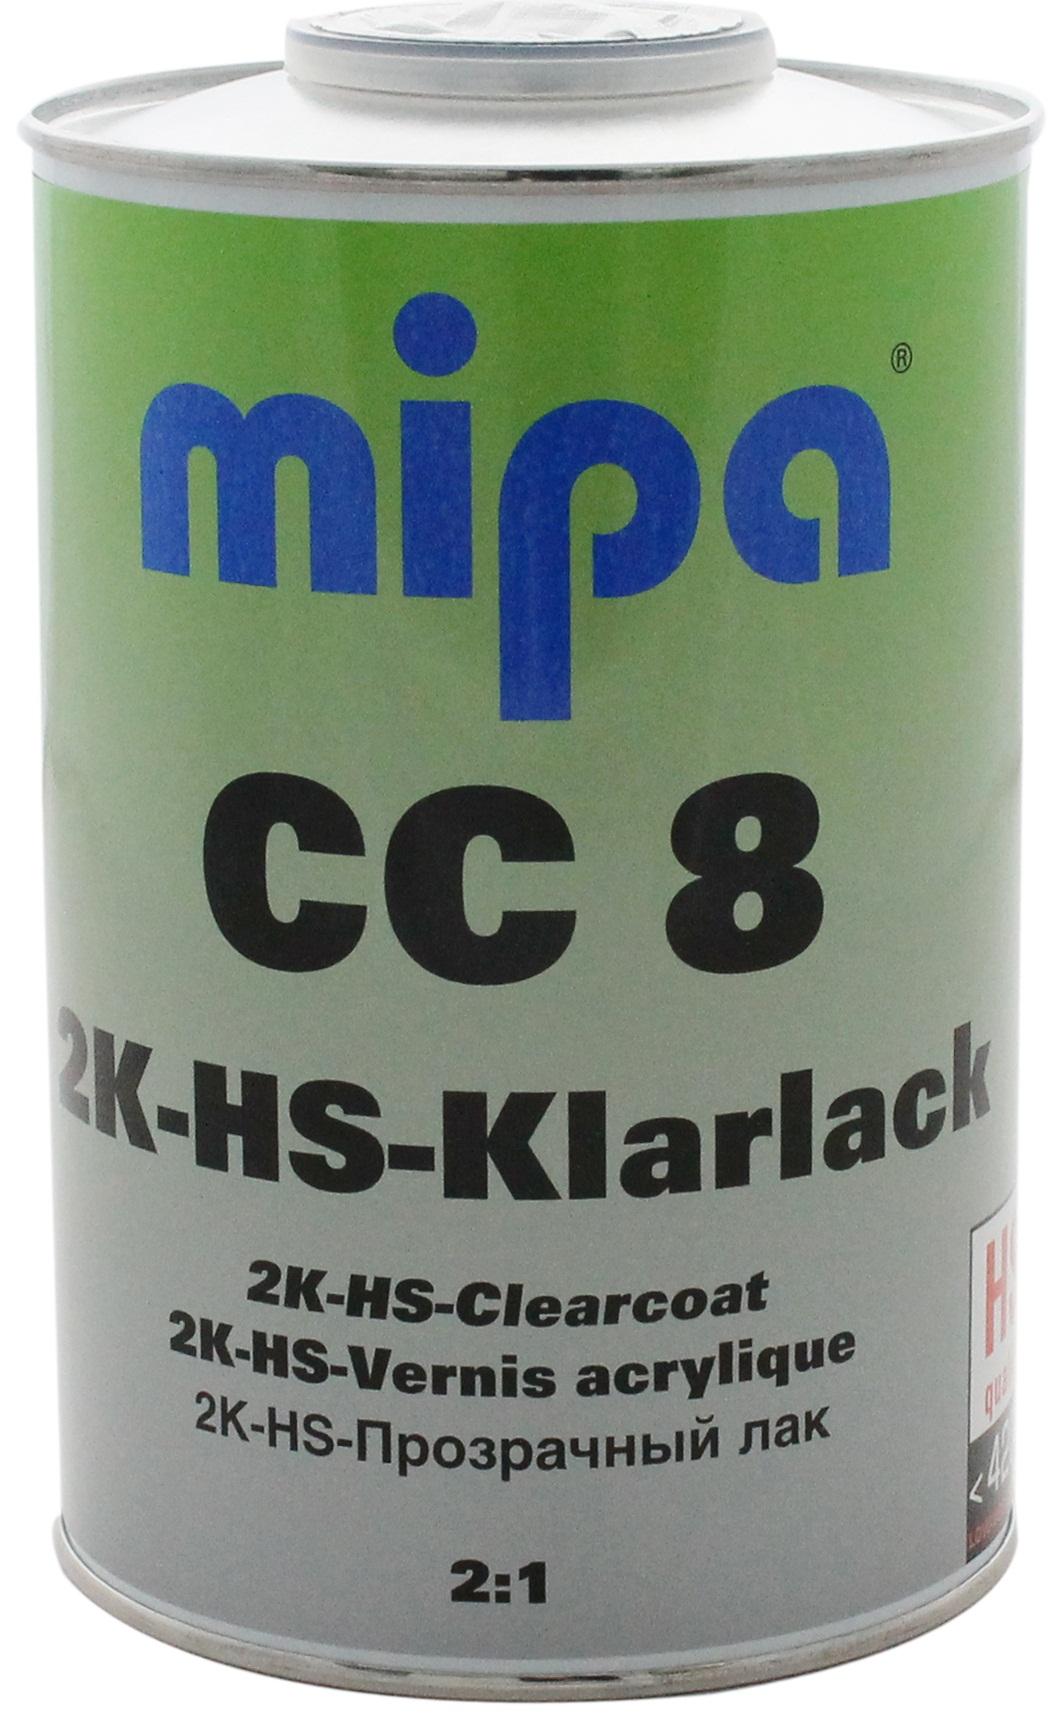 mipa autolack 2k hs klarlack cc 8 preis ab mipcc8 x. Black Bedroom Furniture Sets. Home Design Ideas